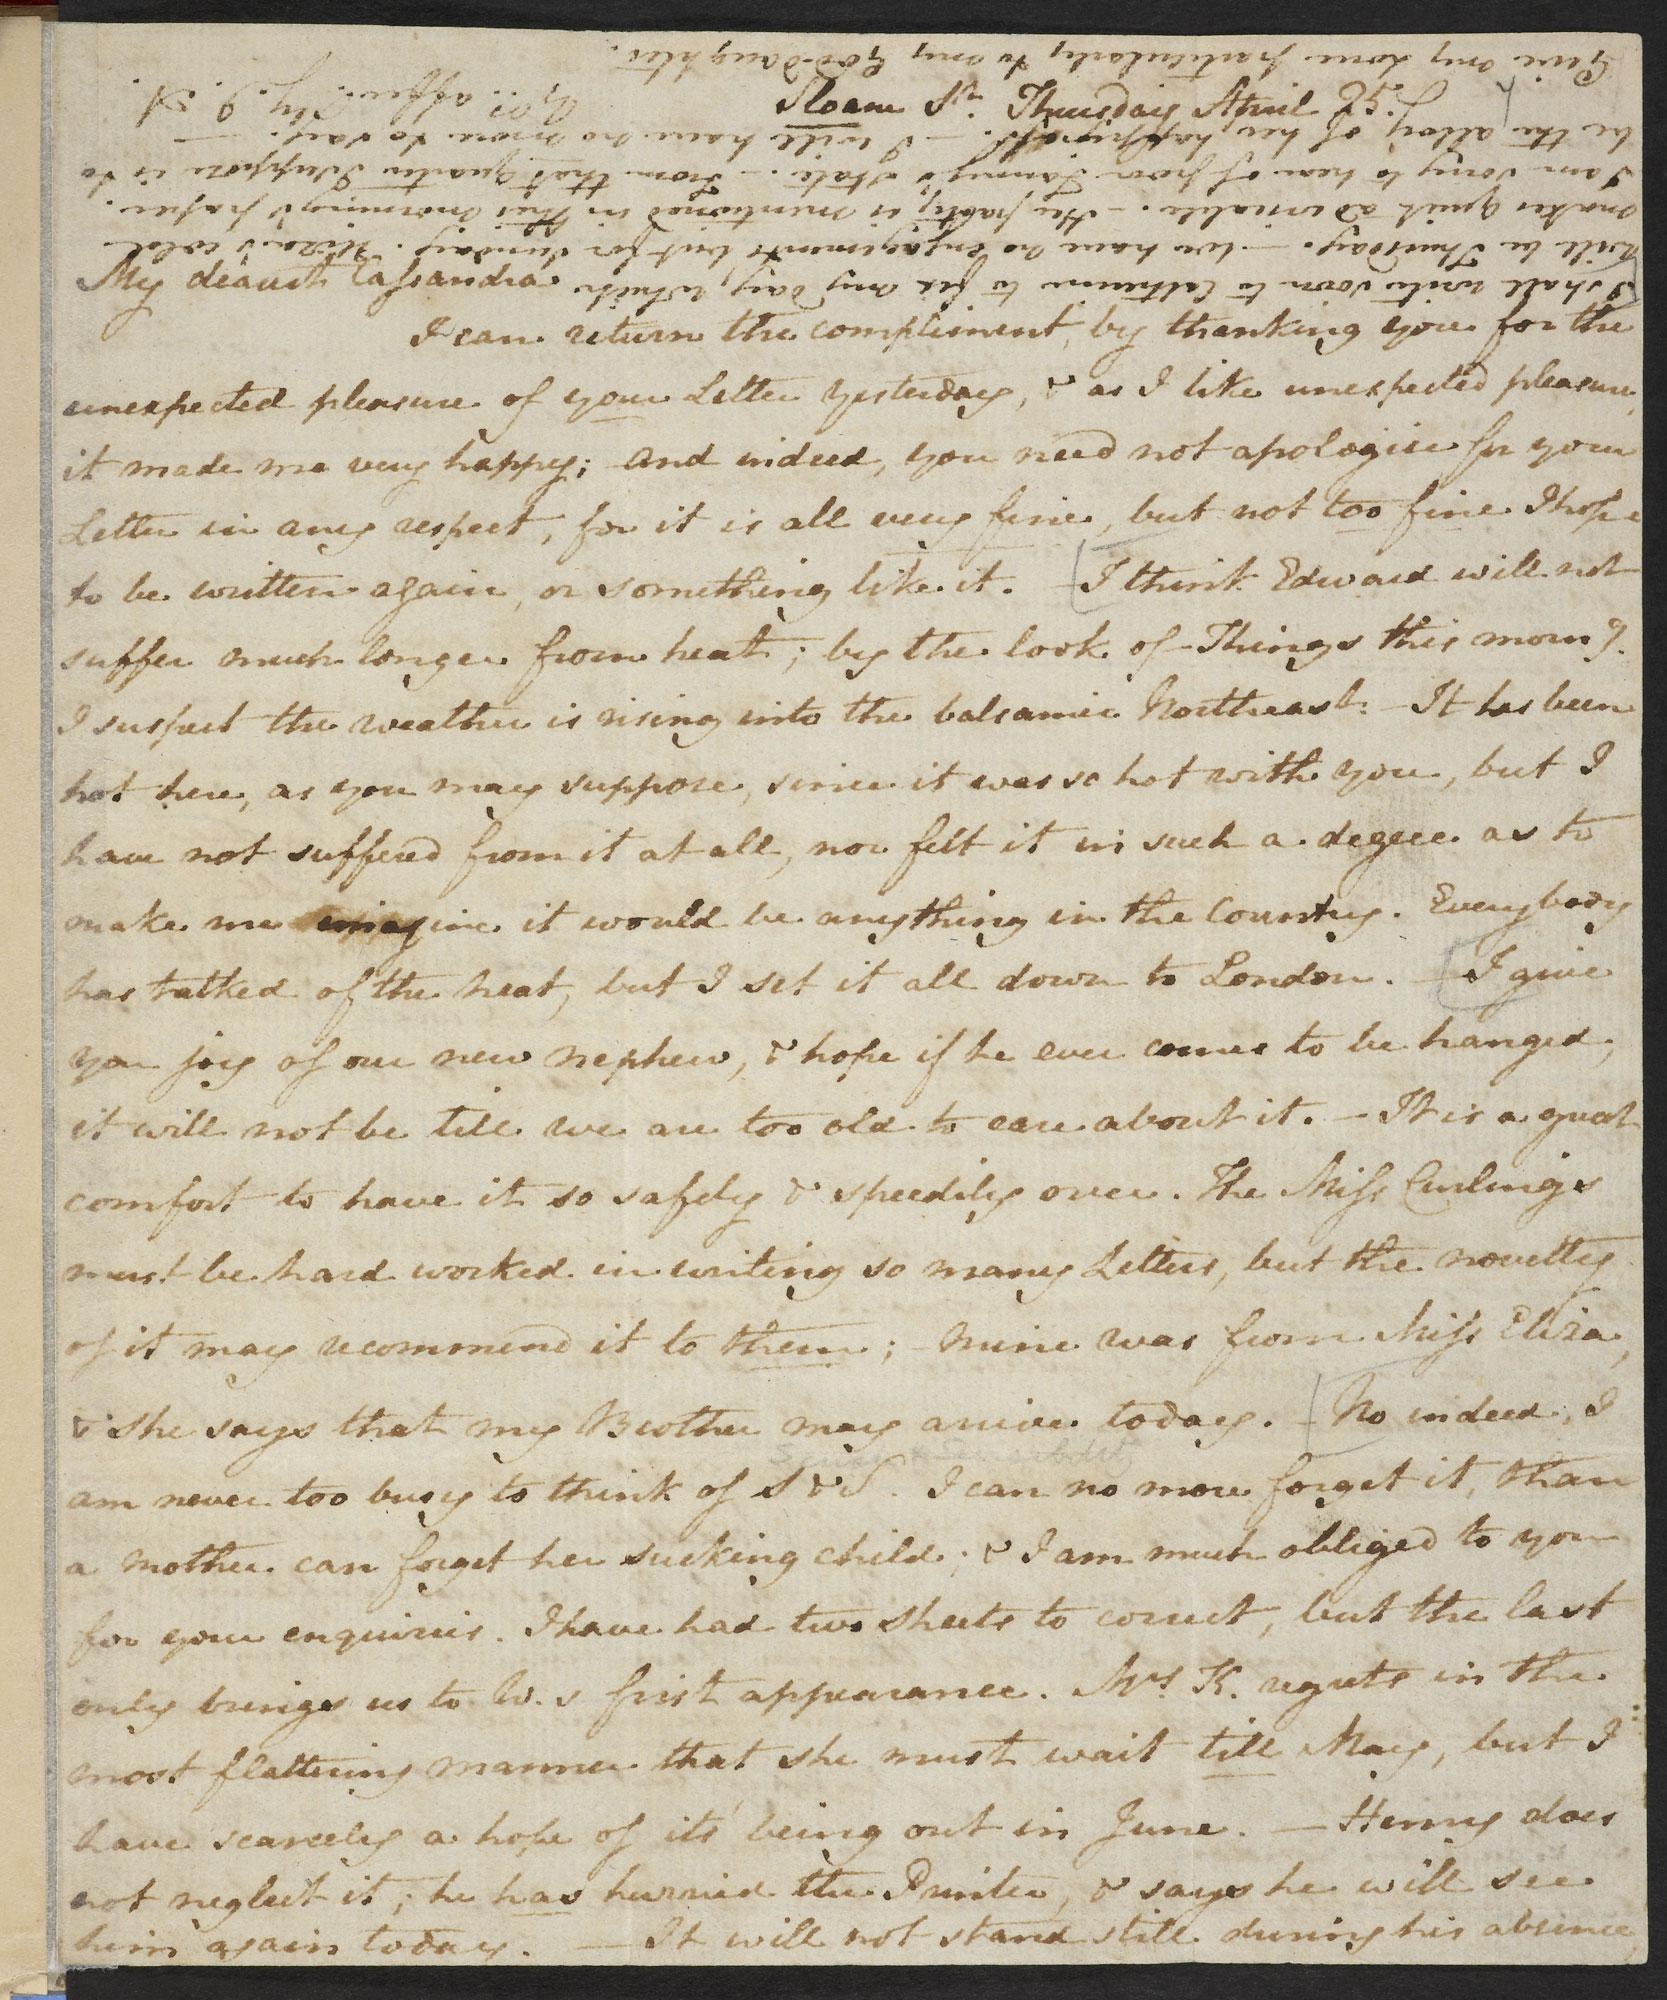 Letter From Jane Austen To Her Sister Cassandra 25 April 1811 The